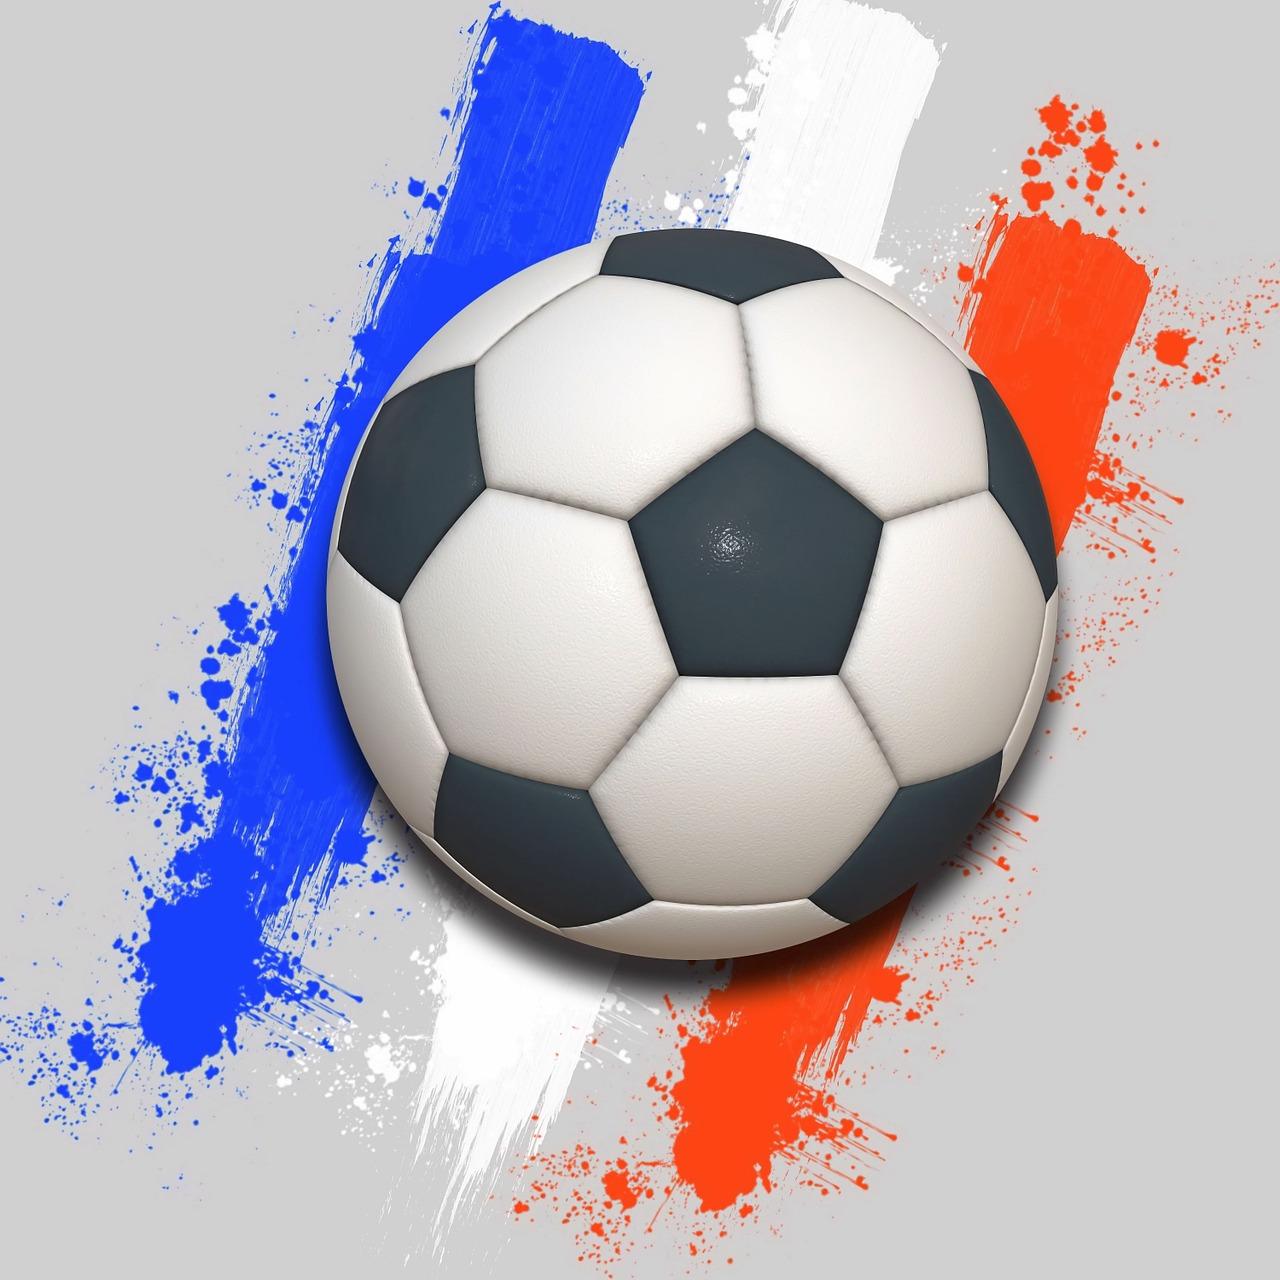 european-championship-1390490_1280